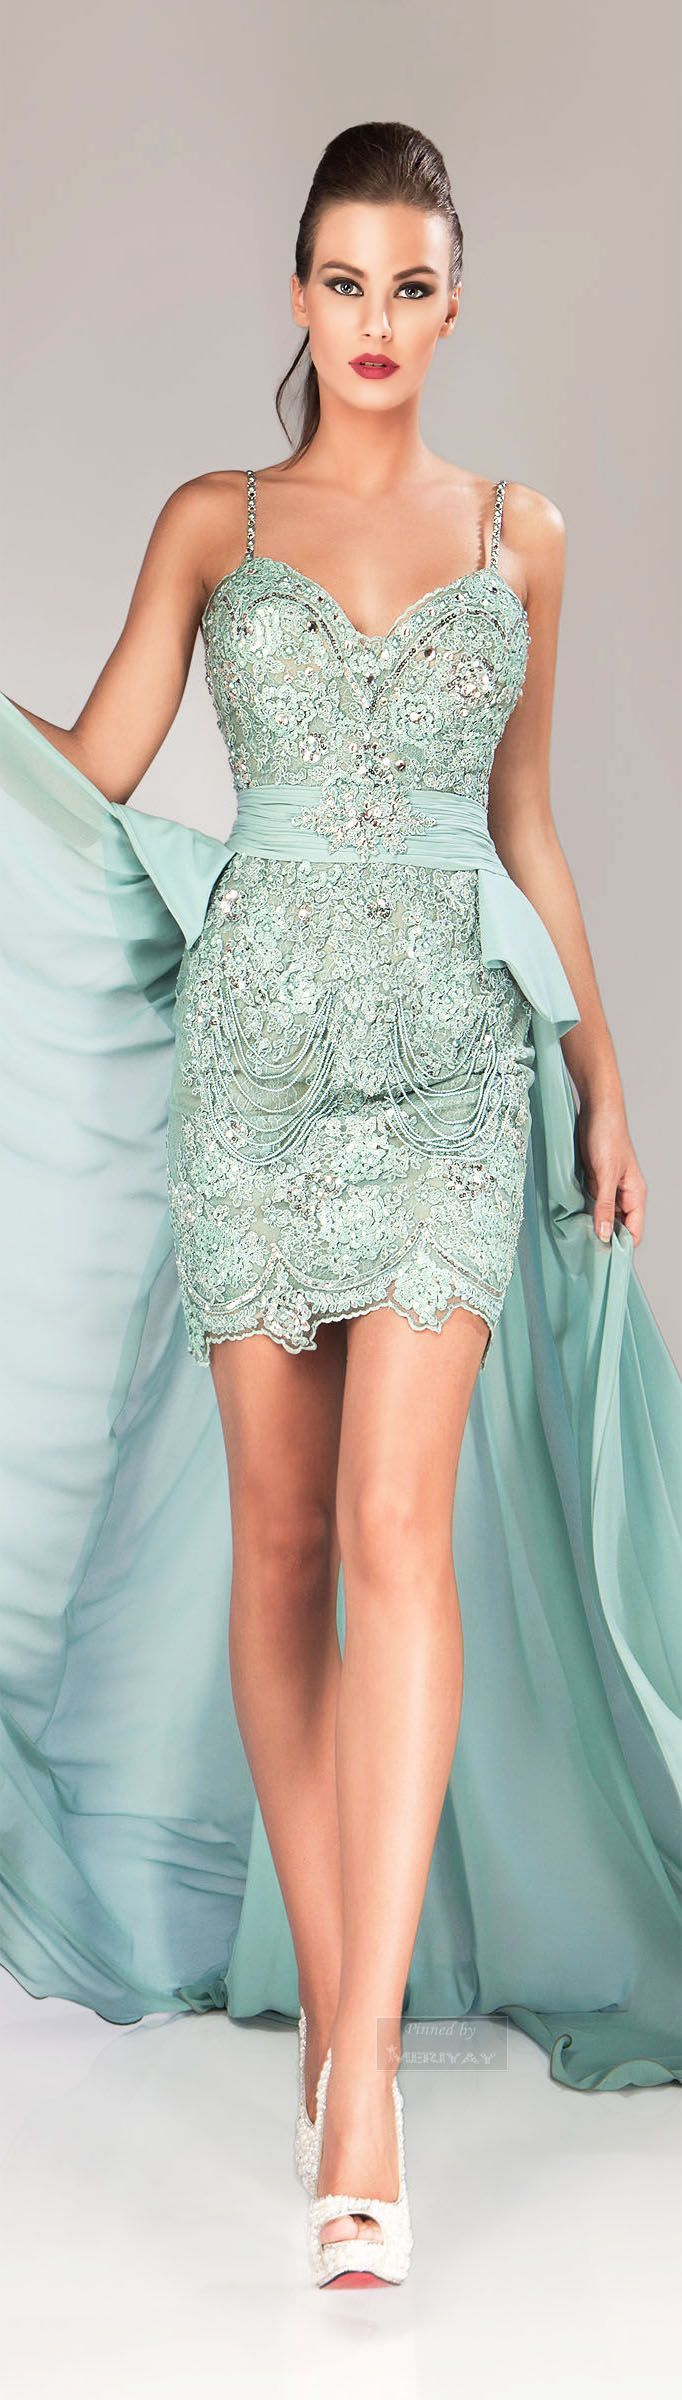 www.nowaroos.com انجمن های نوعروس | vestidos | Pinterest ...